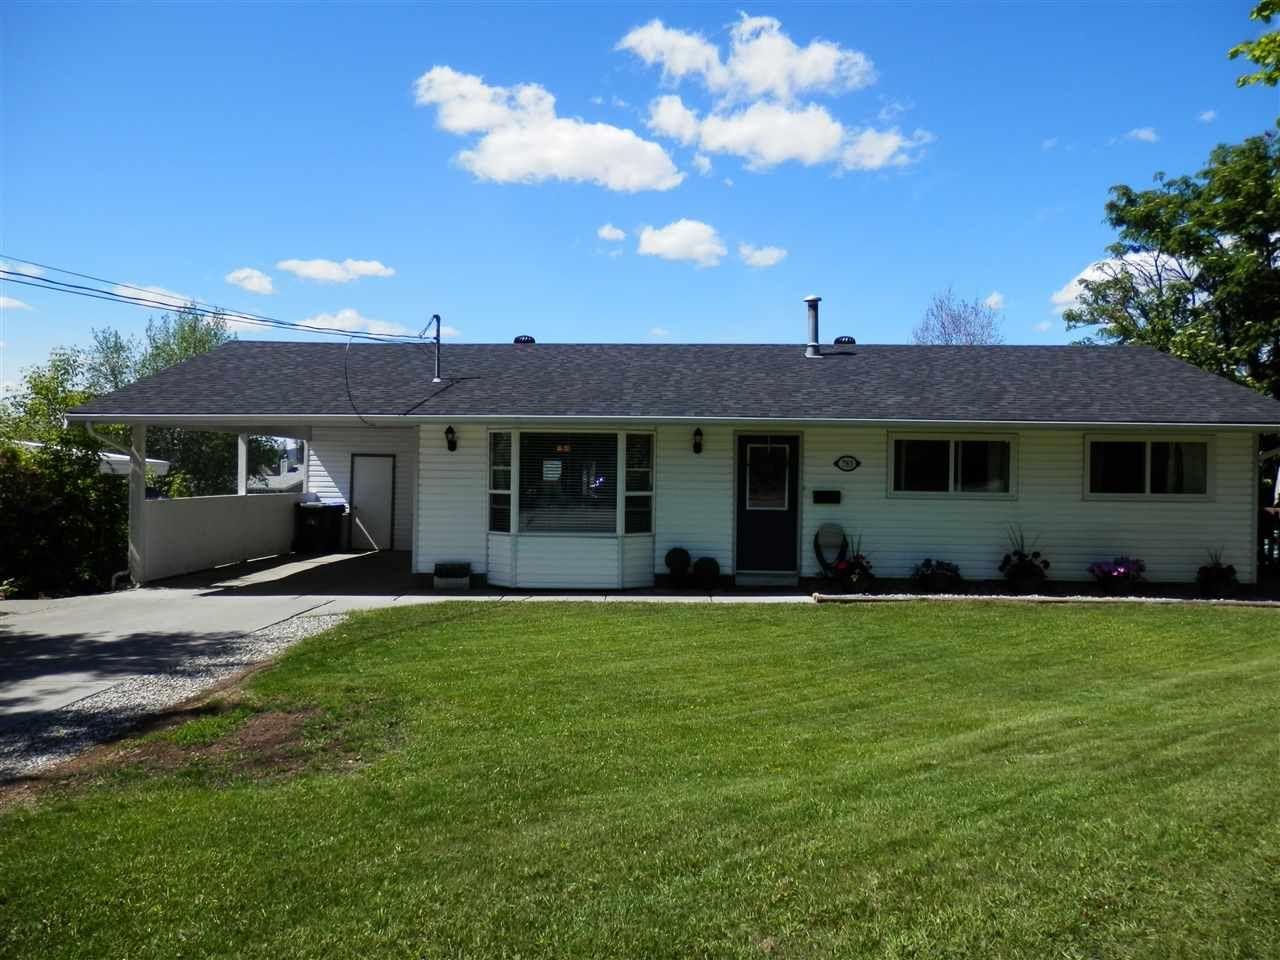 Main Photo: 783 PIGEON Avenue in Williams Lake: Williams Lake - City House for sale (Williams Lake (Zone 27))  : MLS®# R2459919